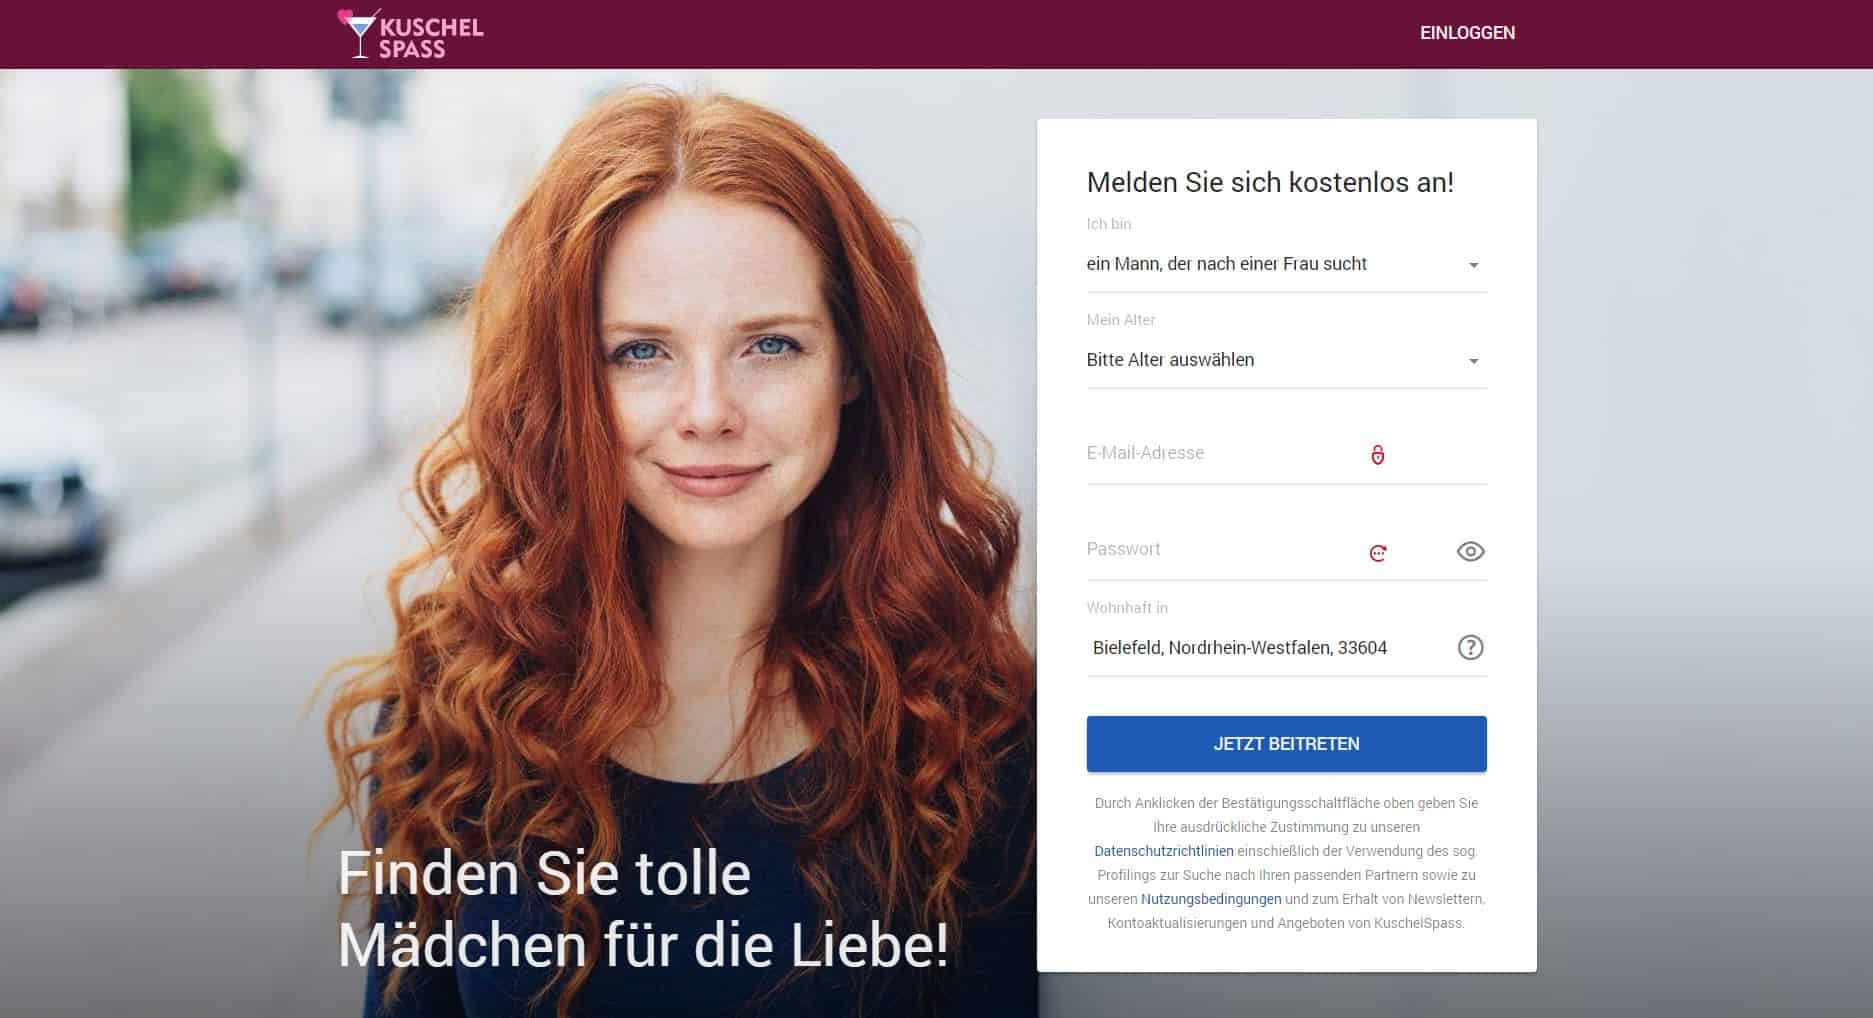 Testbericht - kuschelspass.com Abzocke